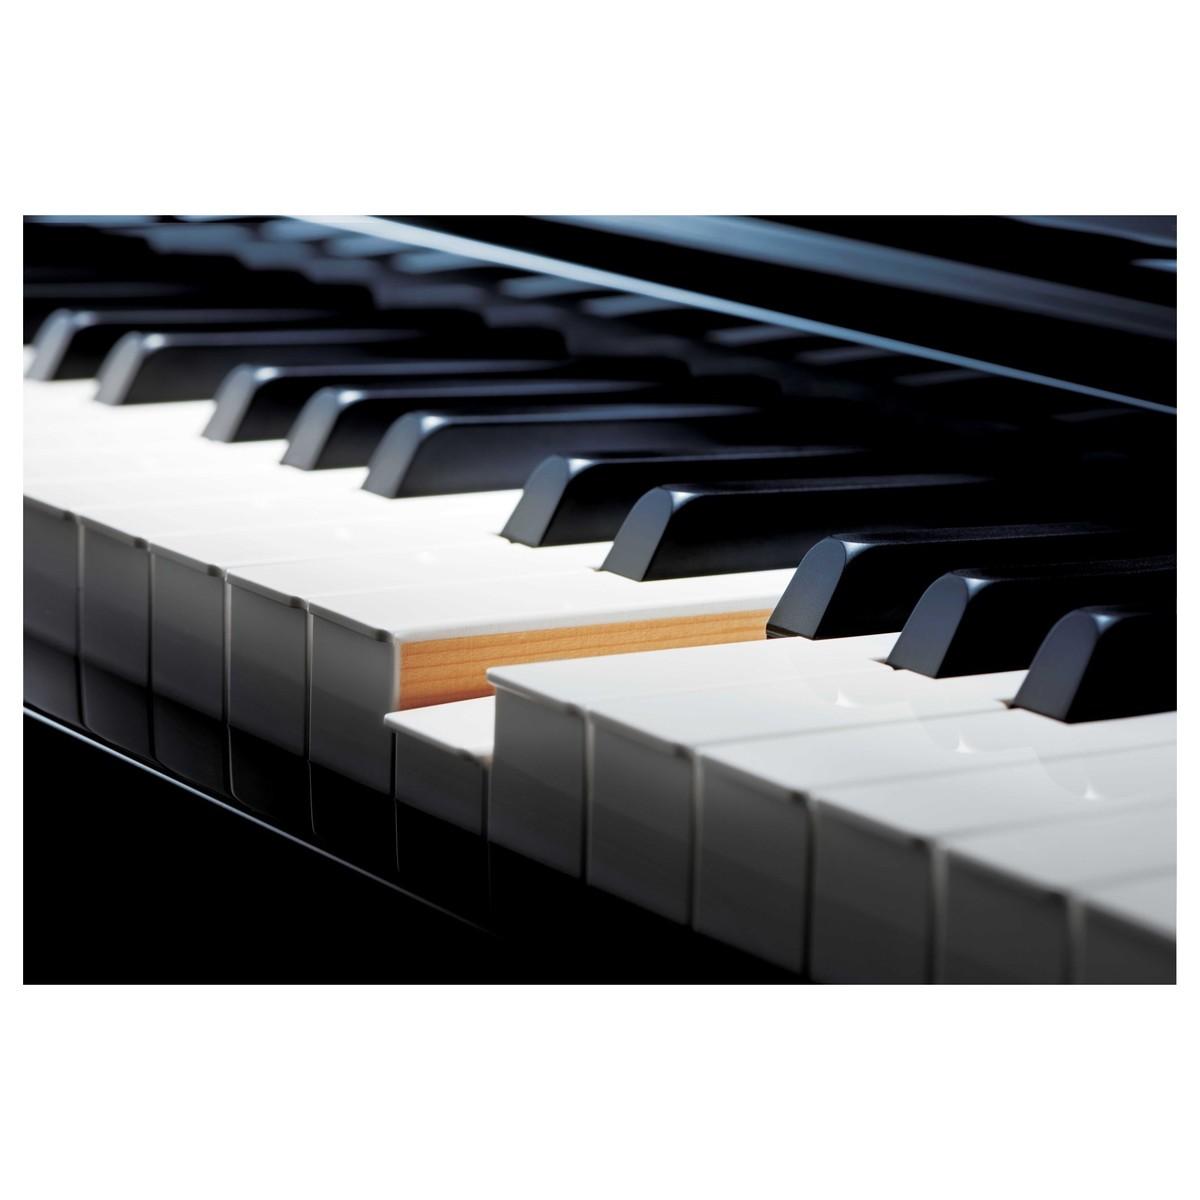 Casio GP-500 Grand Hybrid Piano wooden keys